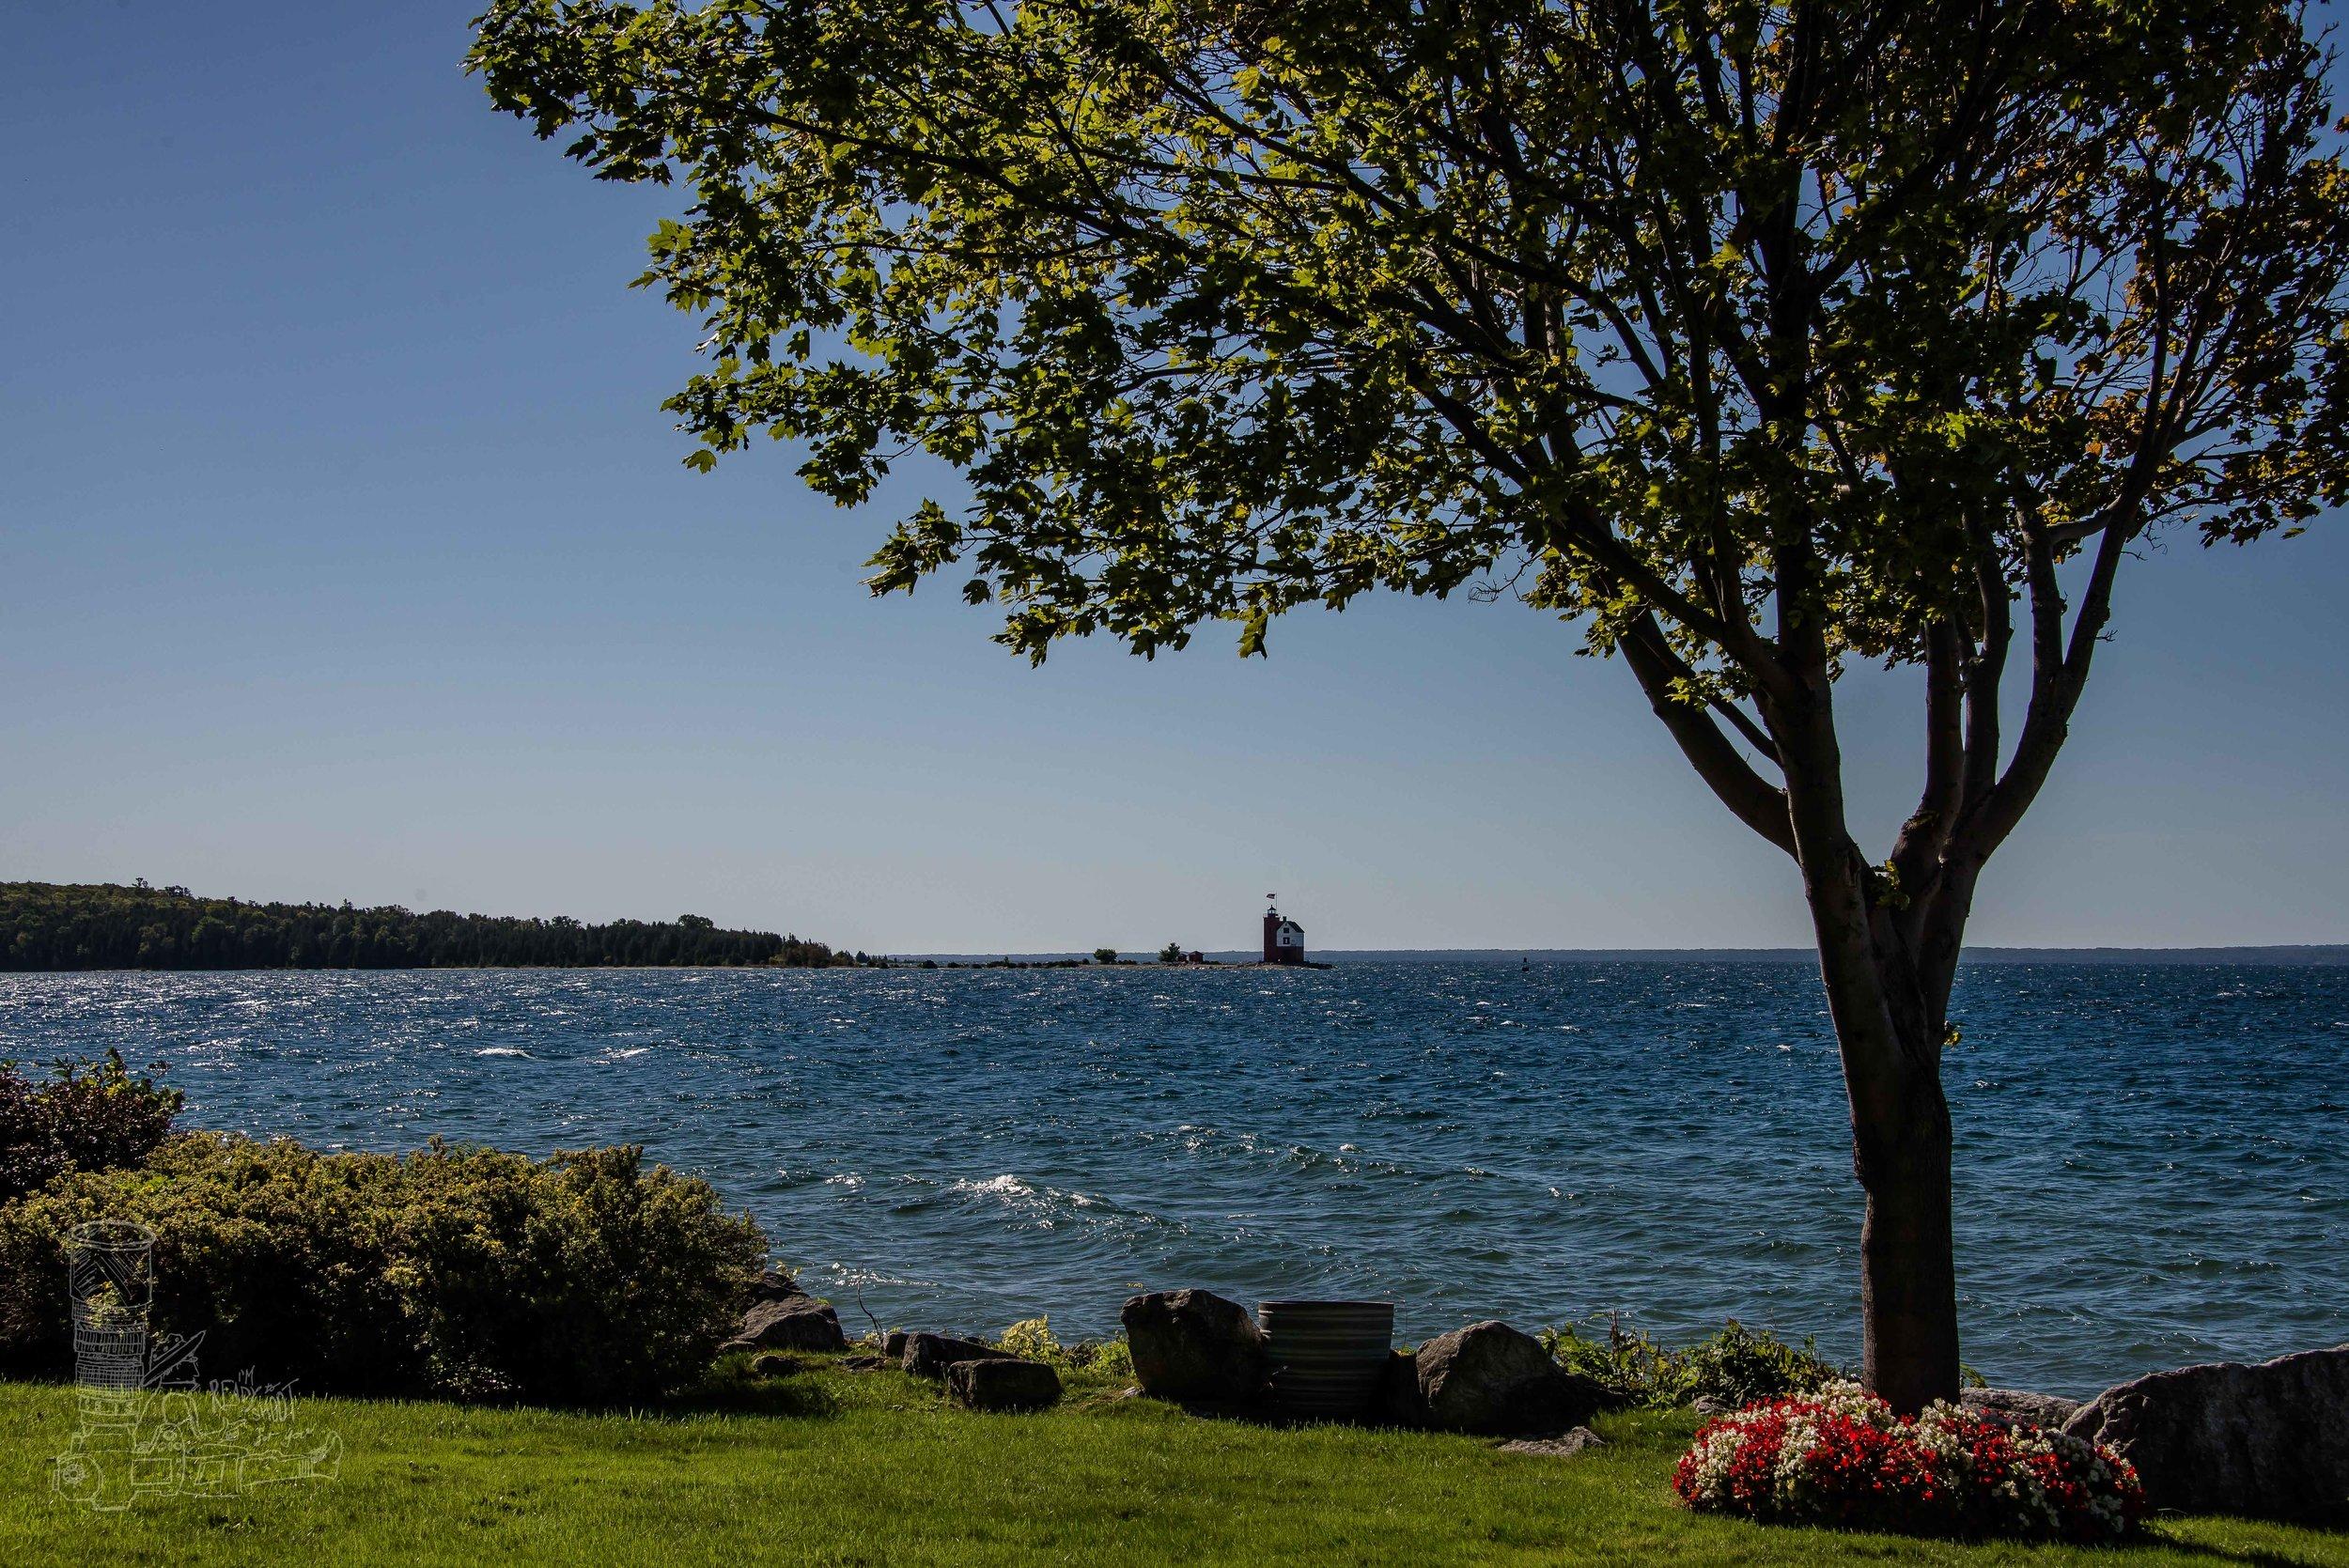 Shores of Mackinac Island